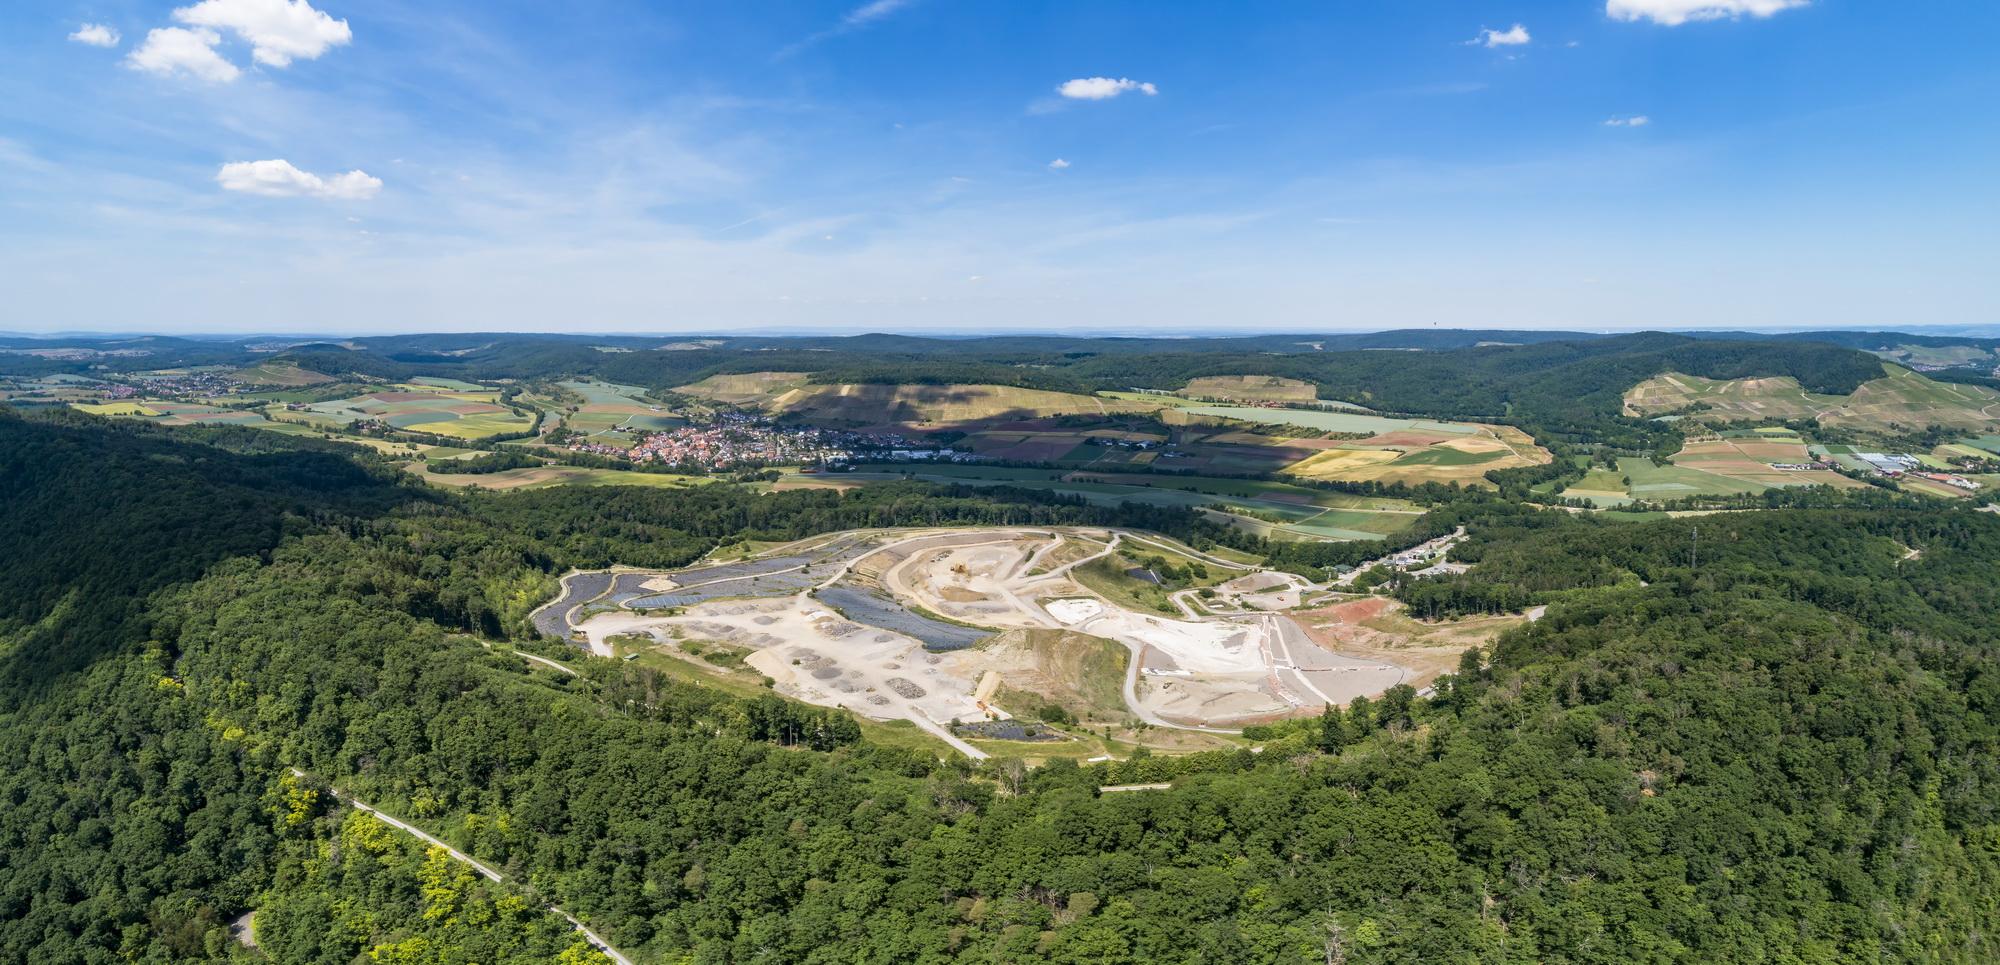 Horrheim: Mülldeponie Burghof